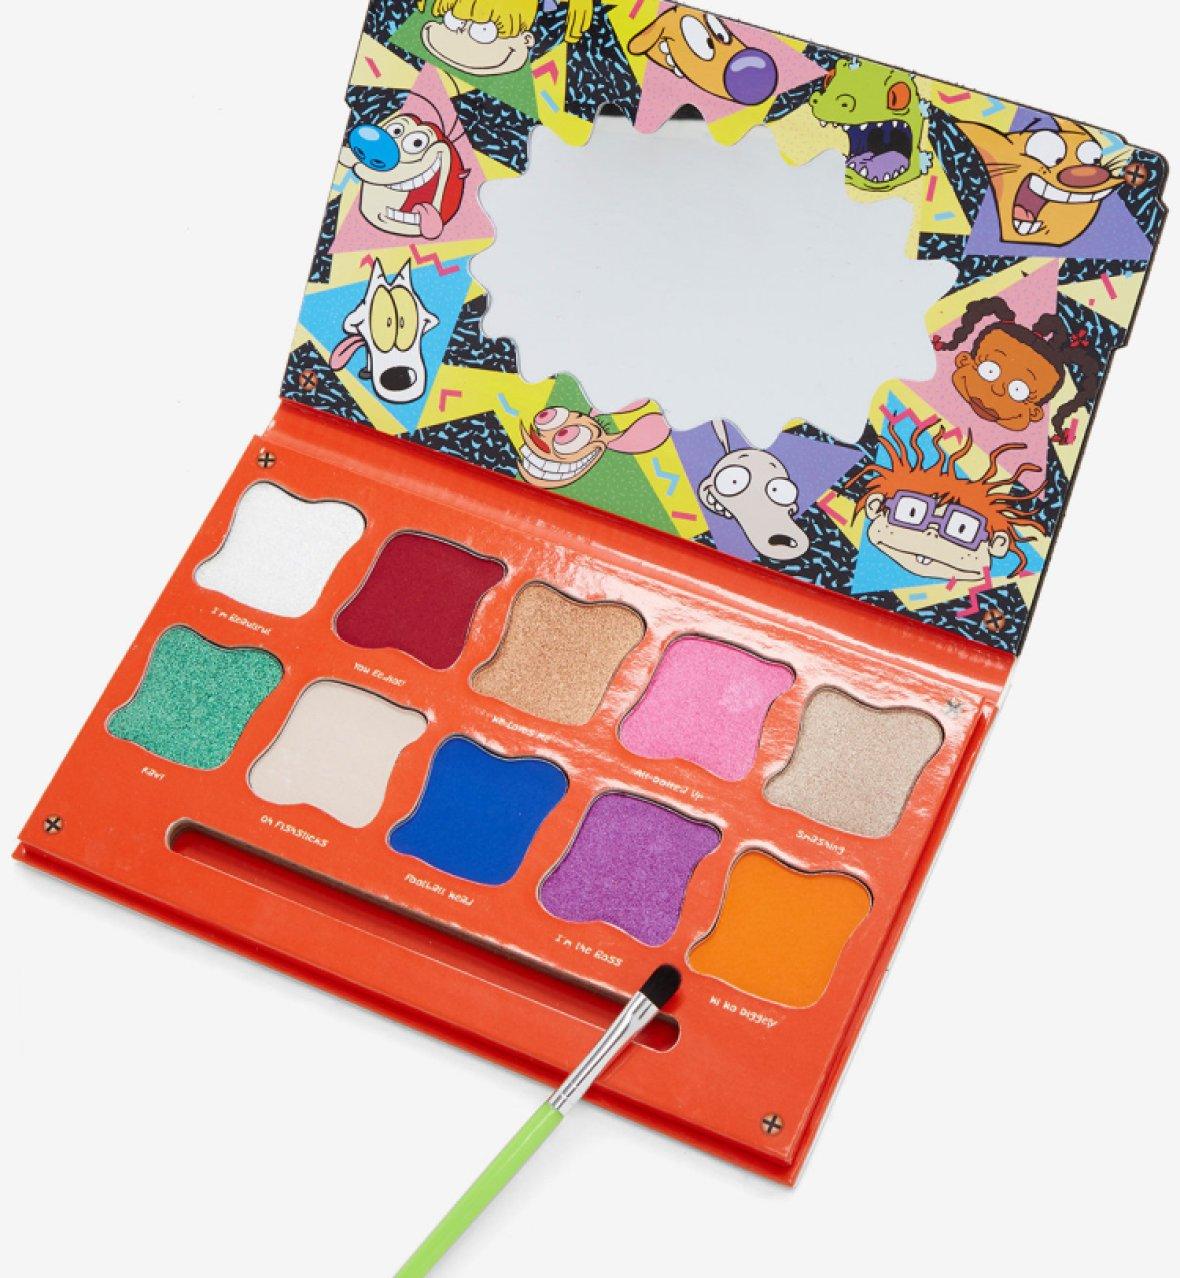 nickelodeon makeup